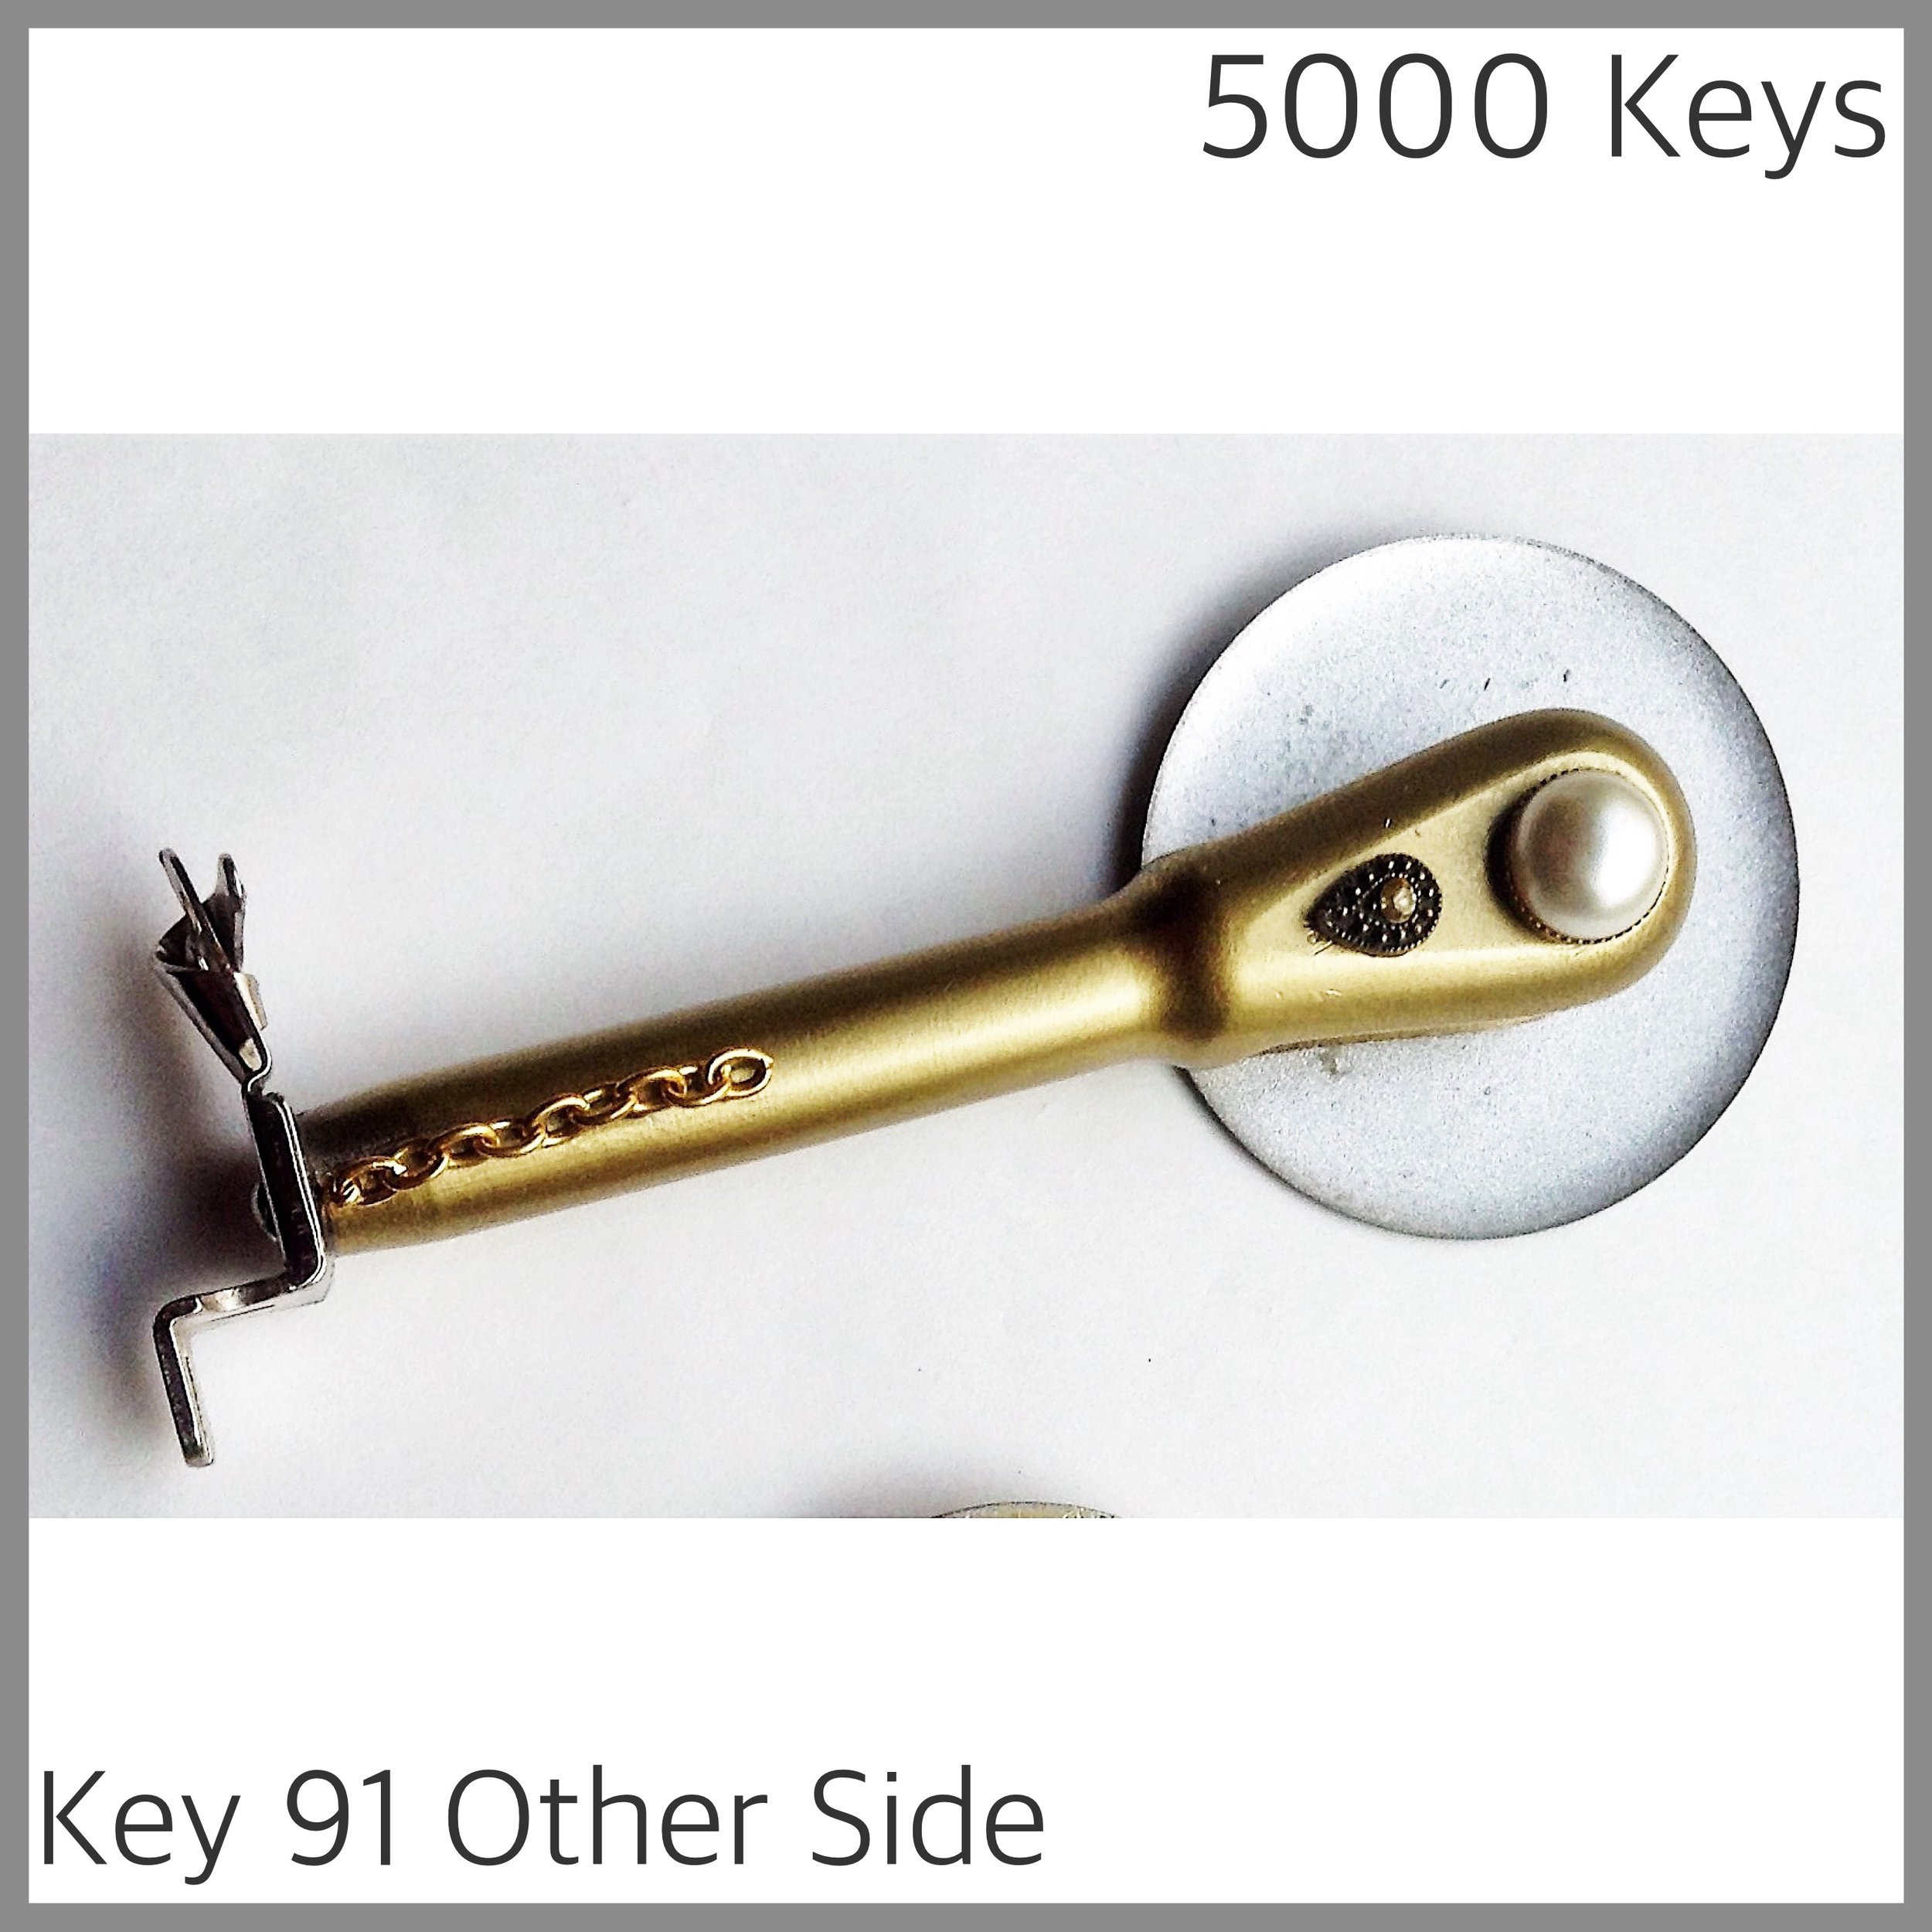 Key 91 other side.JPG